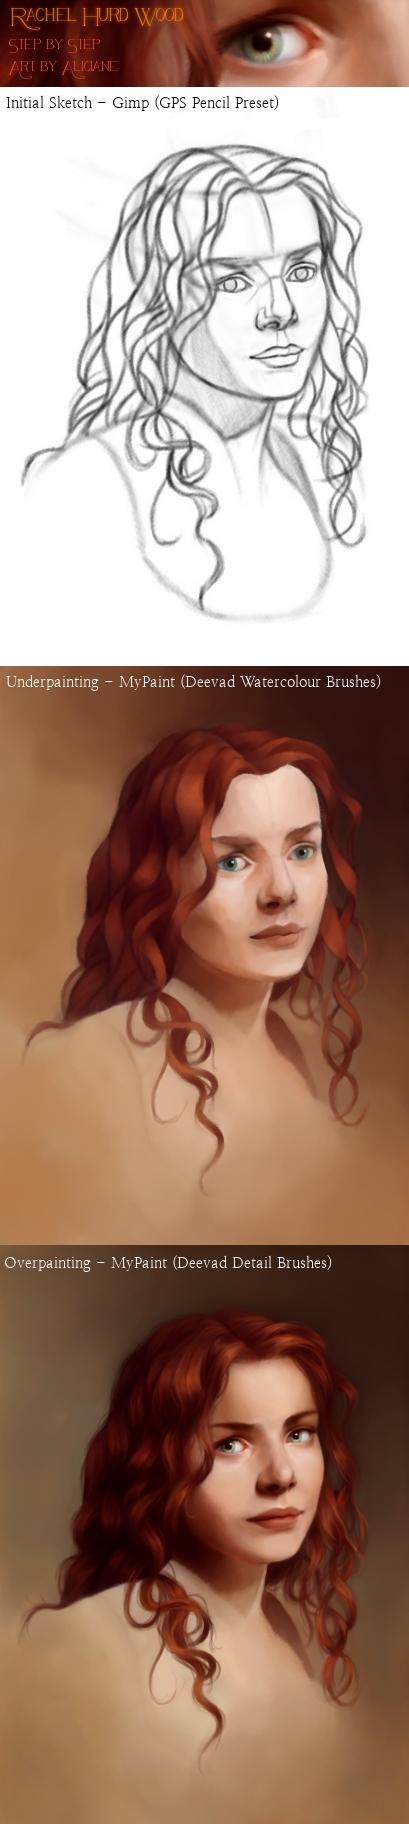 MyPaint / GIMP Process : Rachel Hurd Wood - Steps by Aliciane